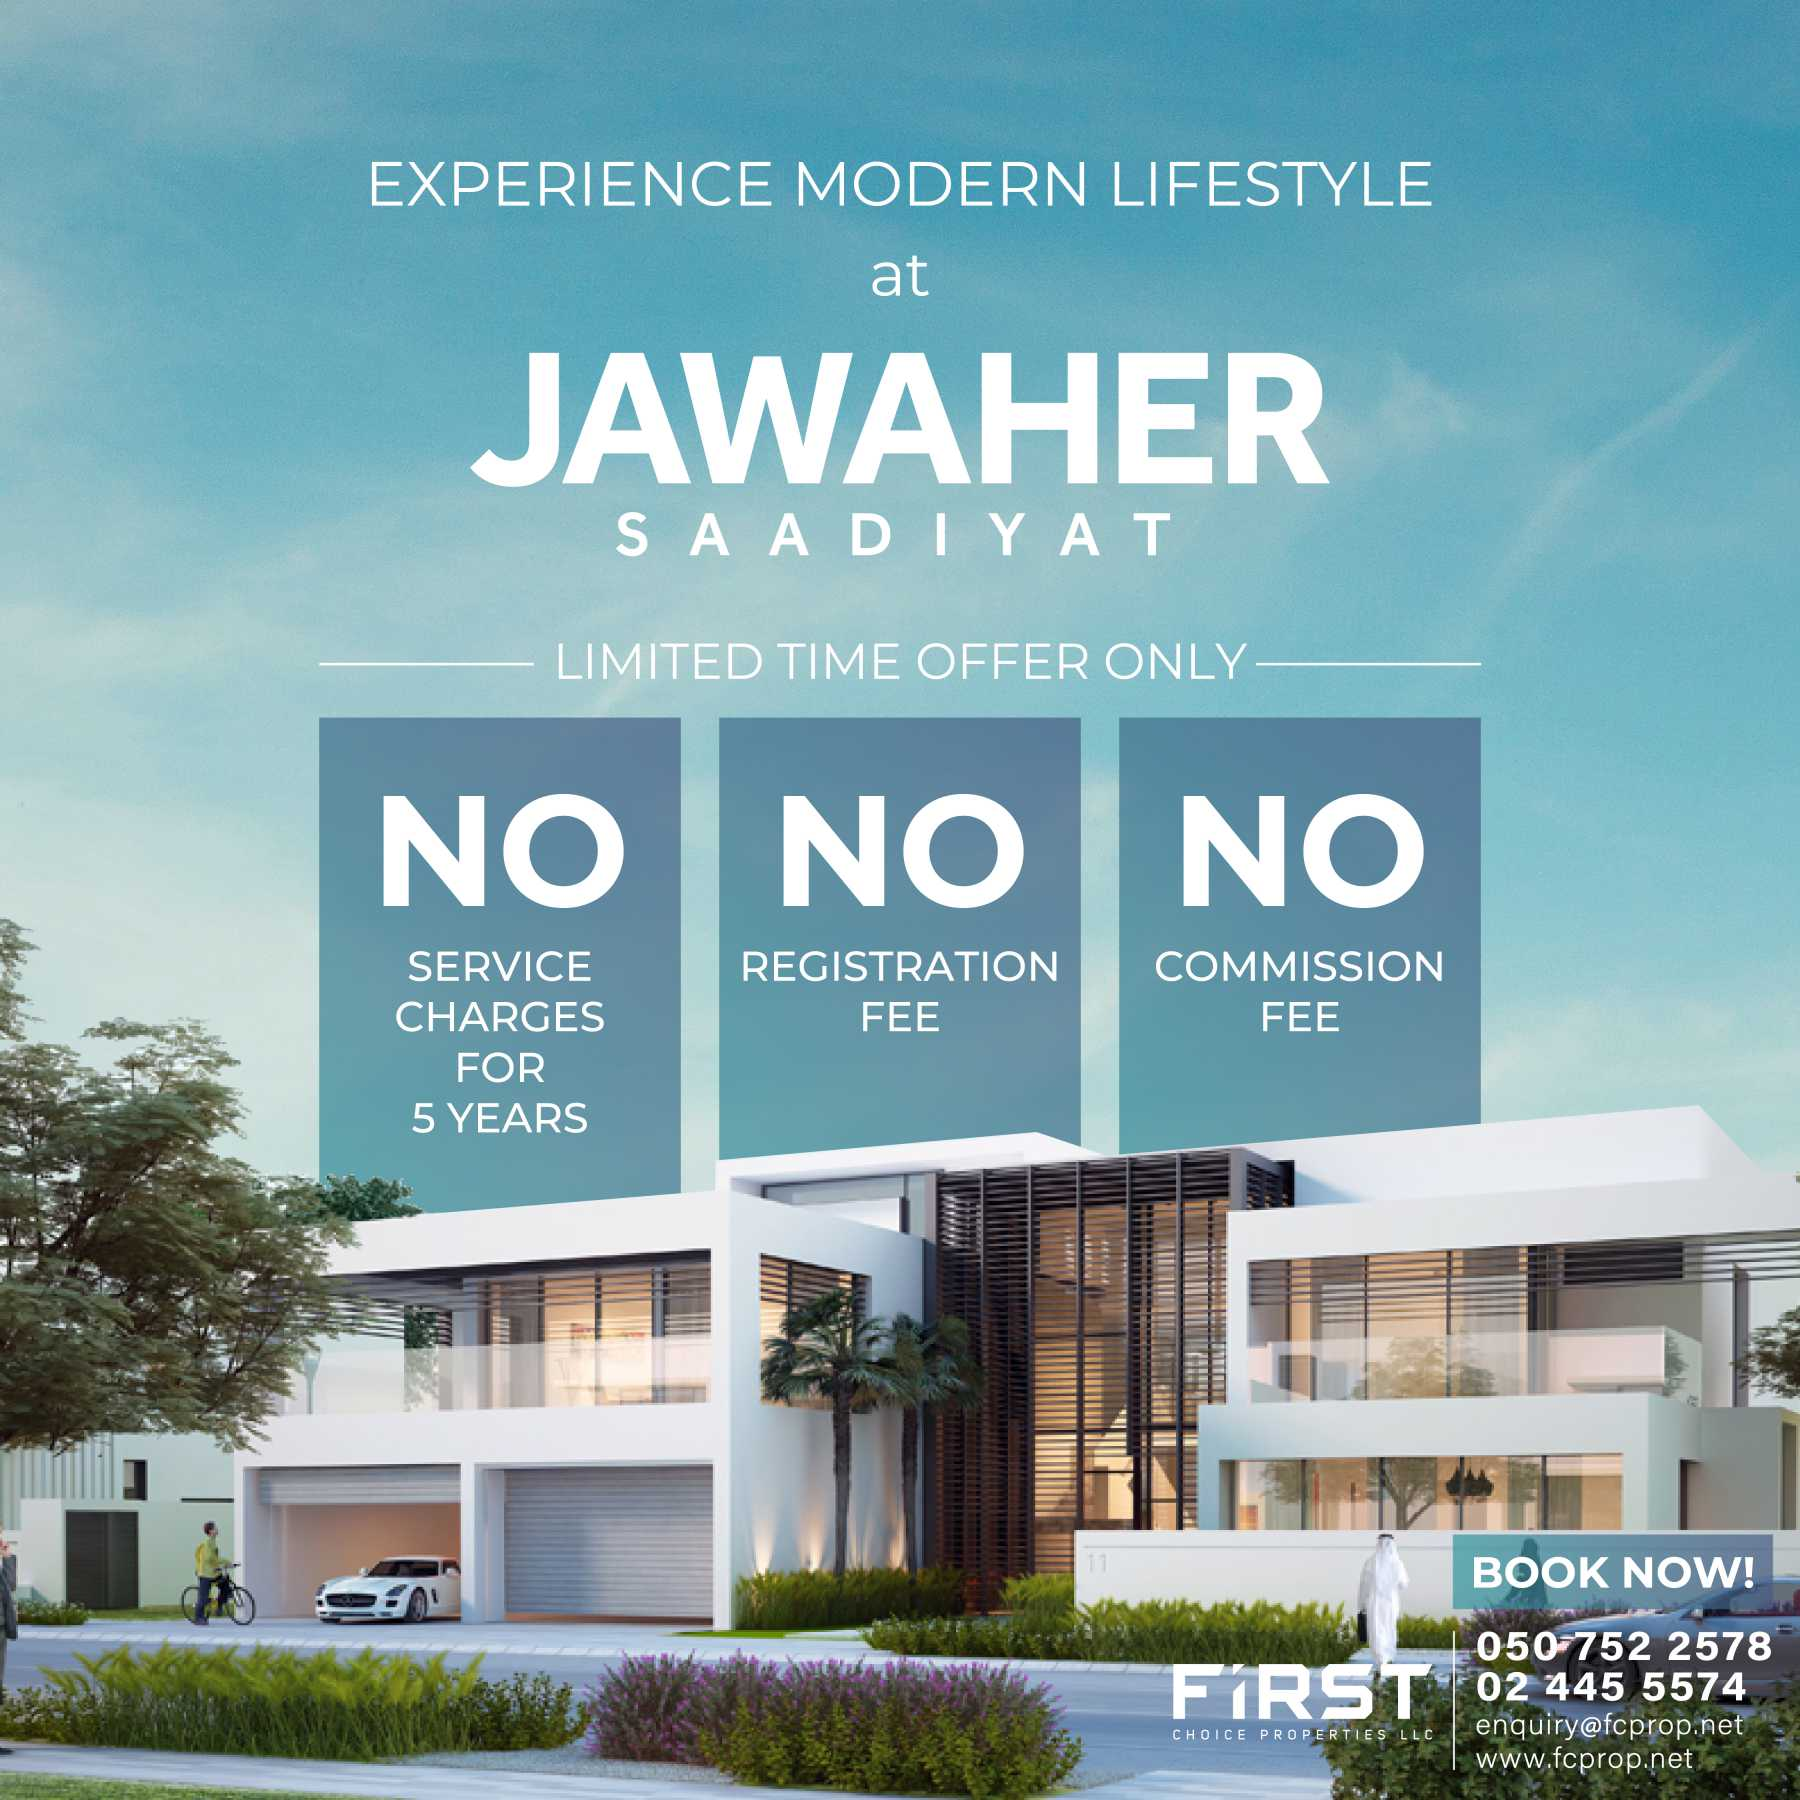 Jawaher Ad.jpg